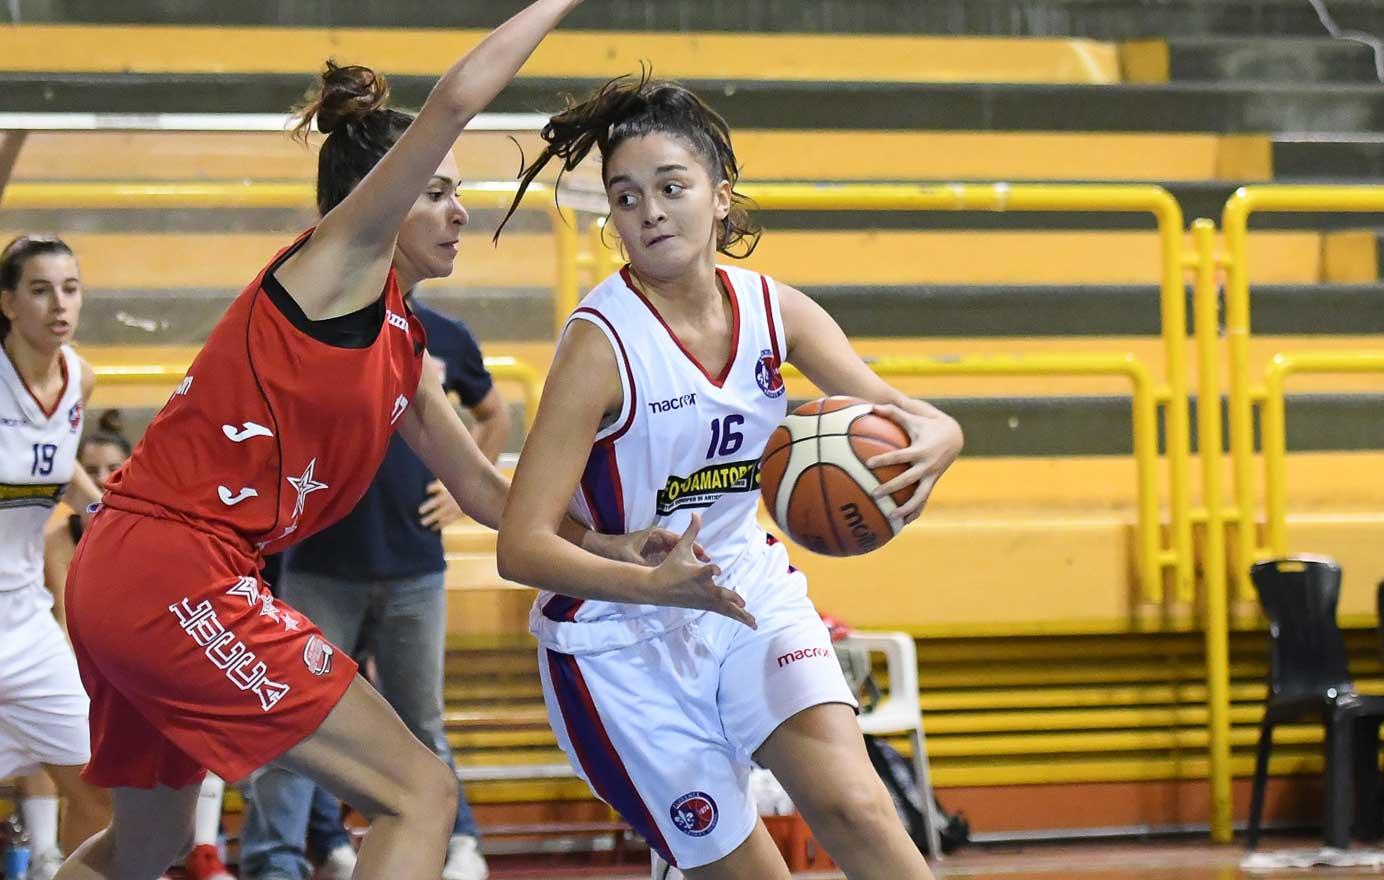 Ultima frazione super e la Florence sbanca Lavagna - Firenze Basketblog